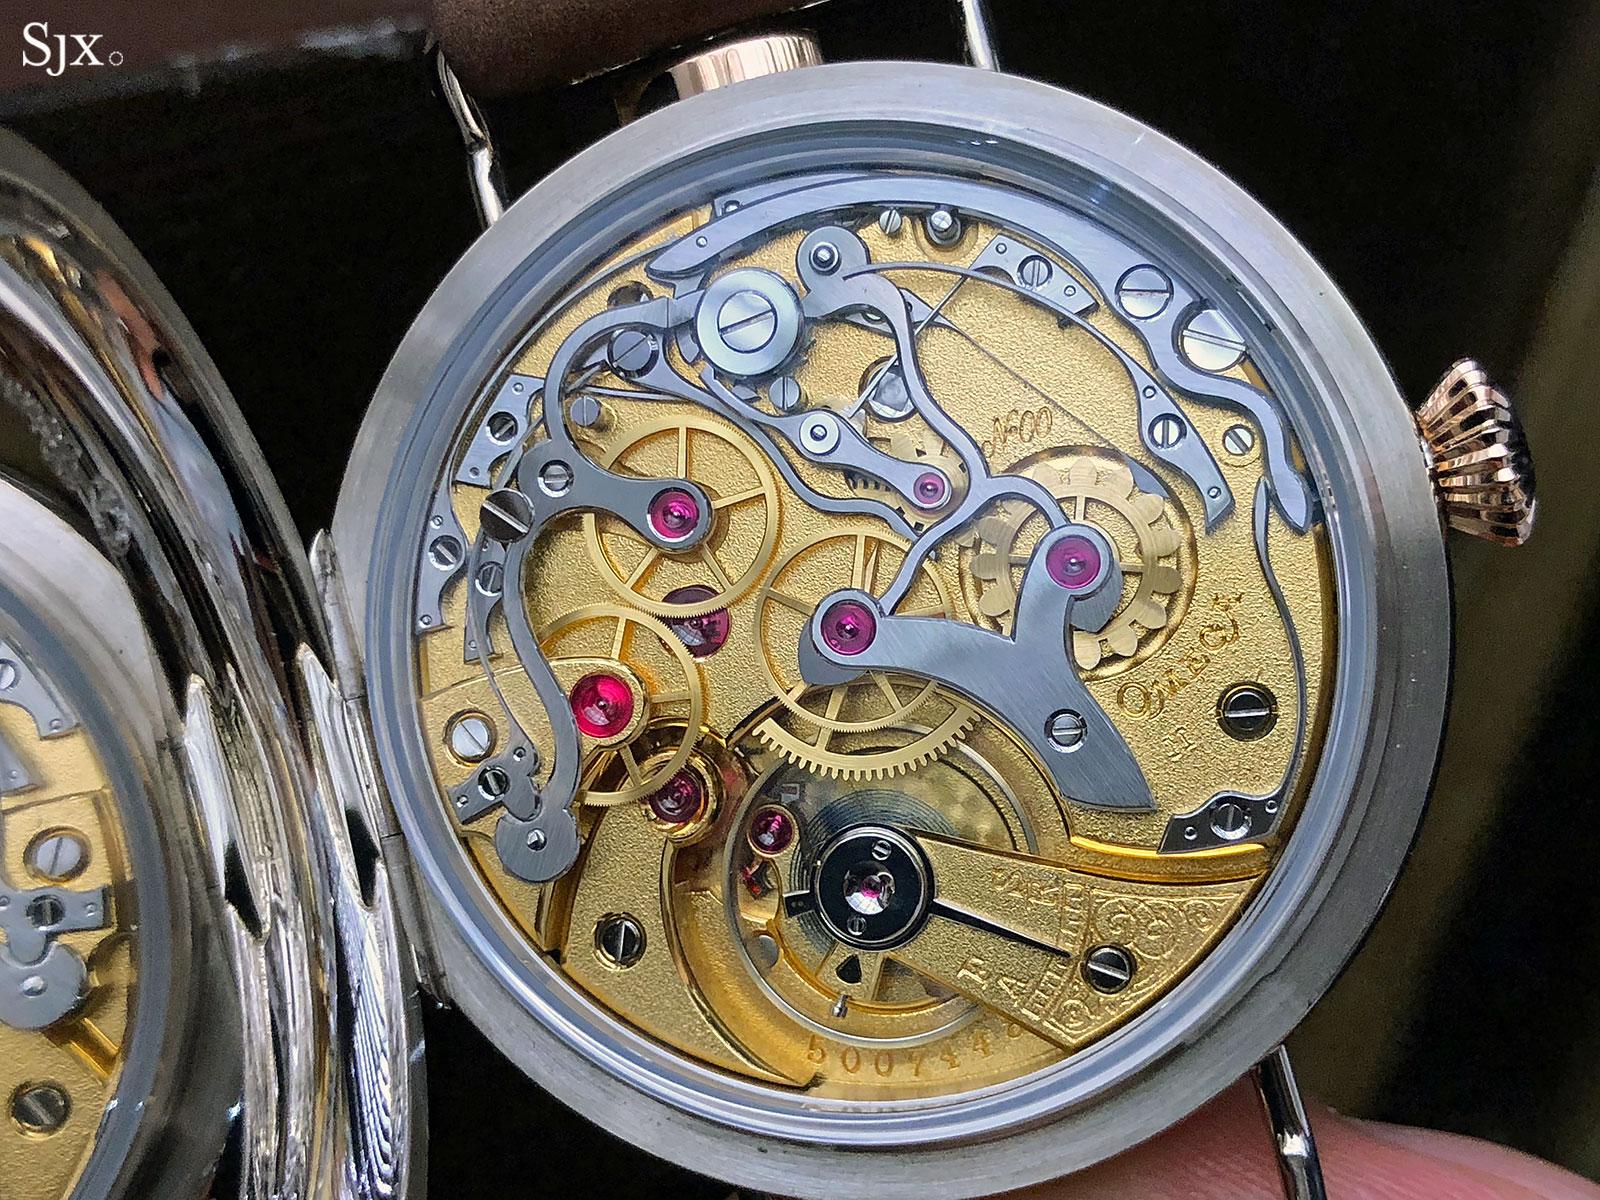 First OMEGA Wrist-Chronograph Limited Edition 18'''CHRO 13